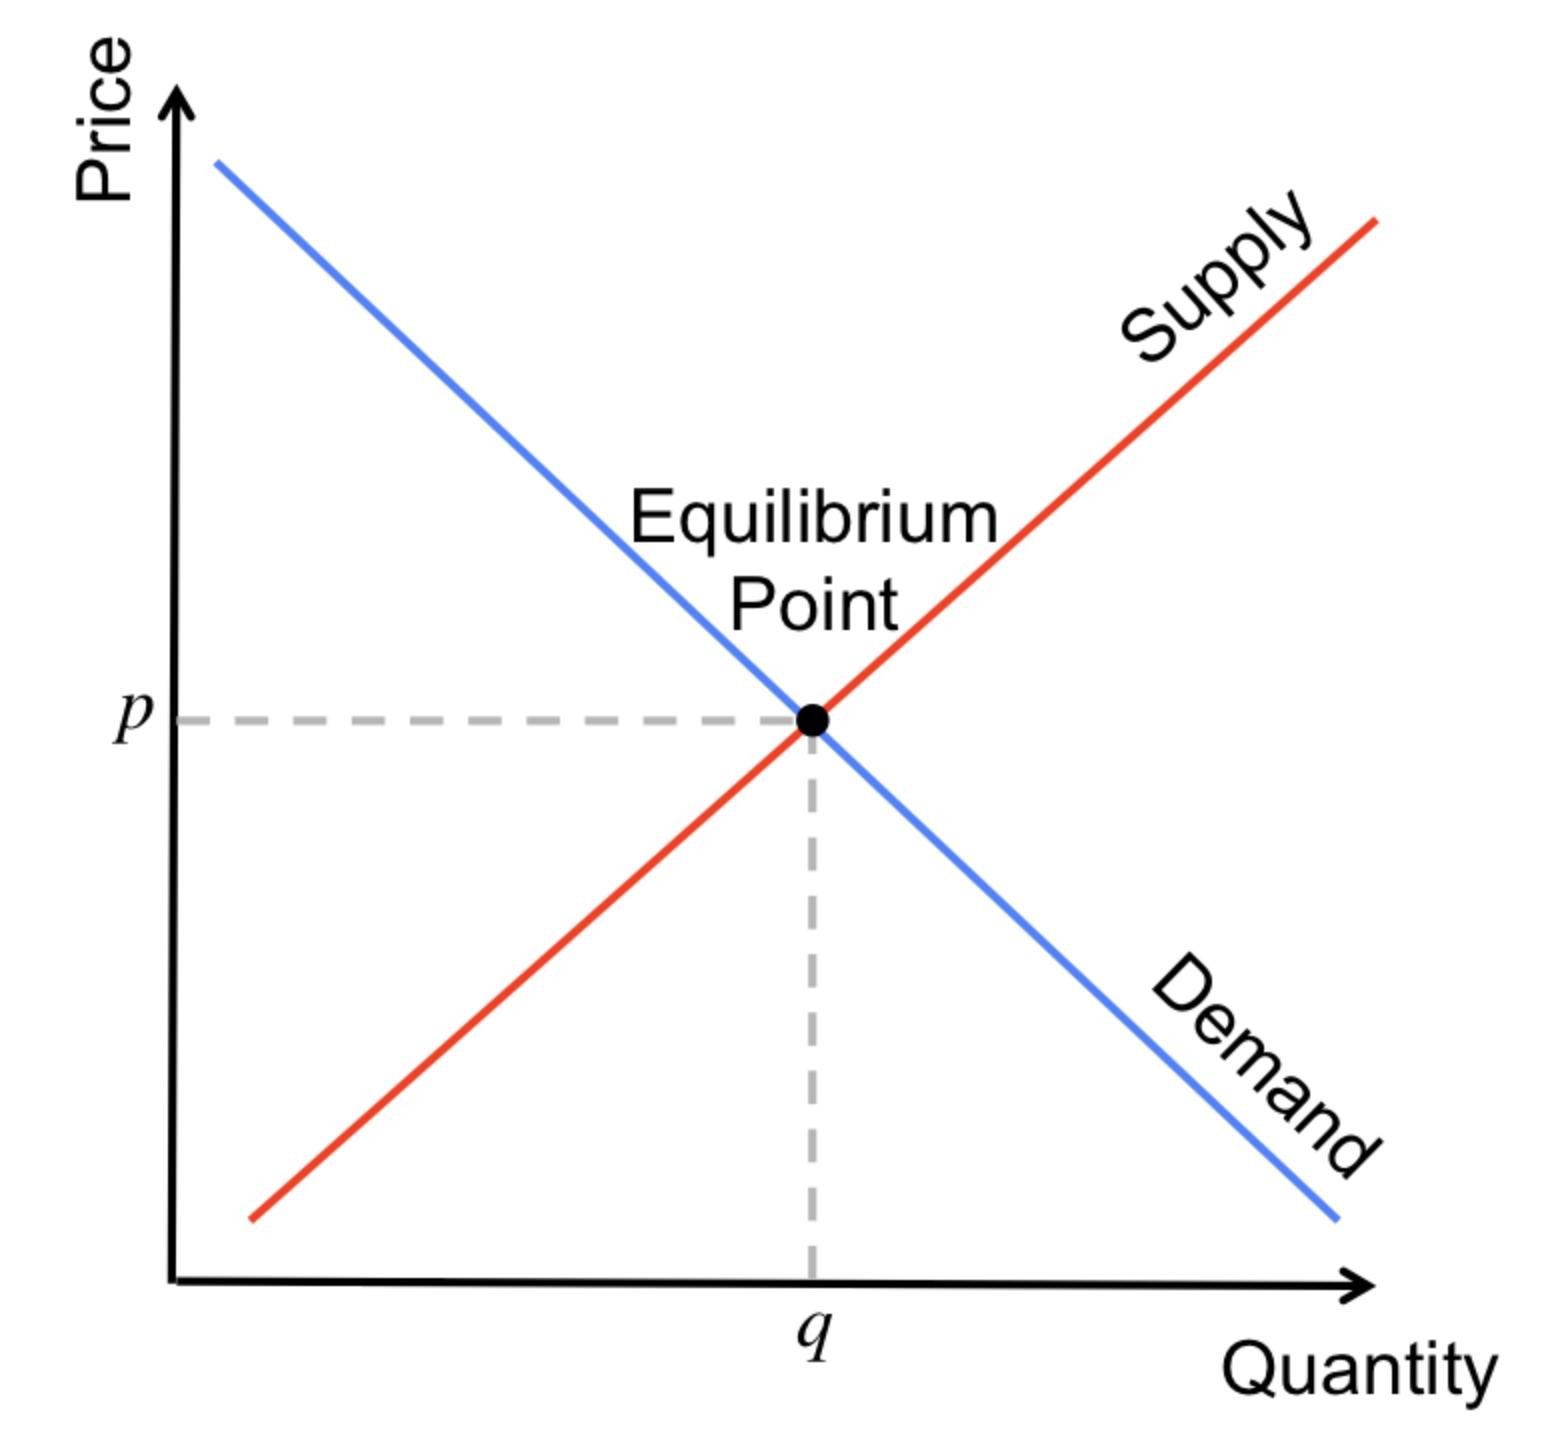 Supply_and_Demand.jpg